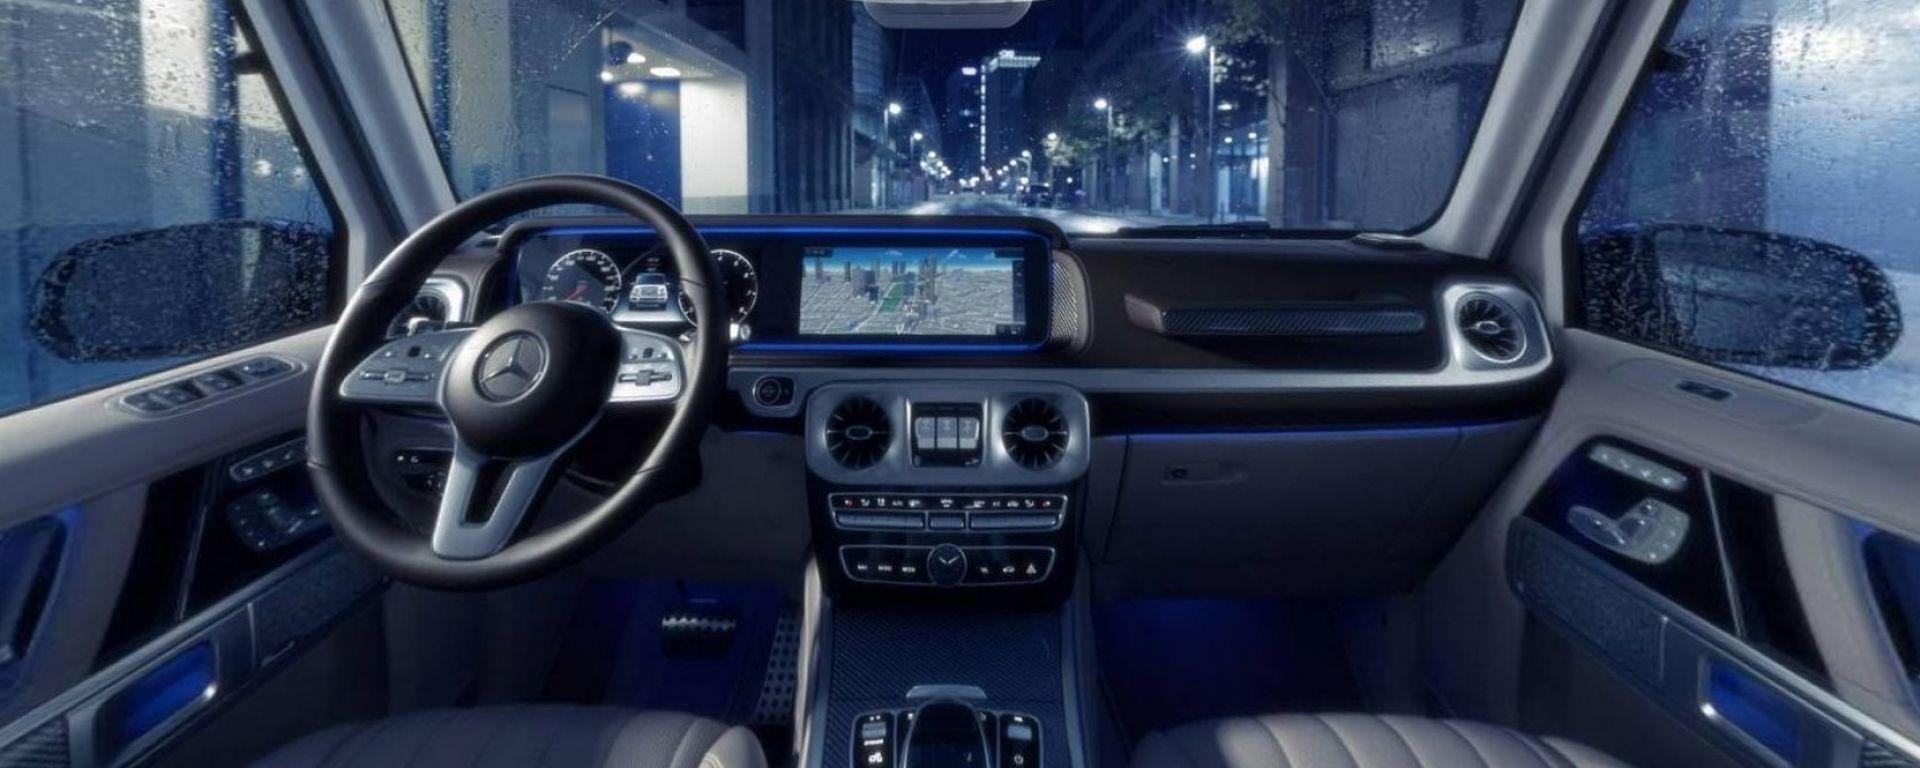 SUV Mercedes G